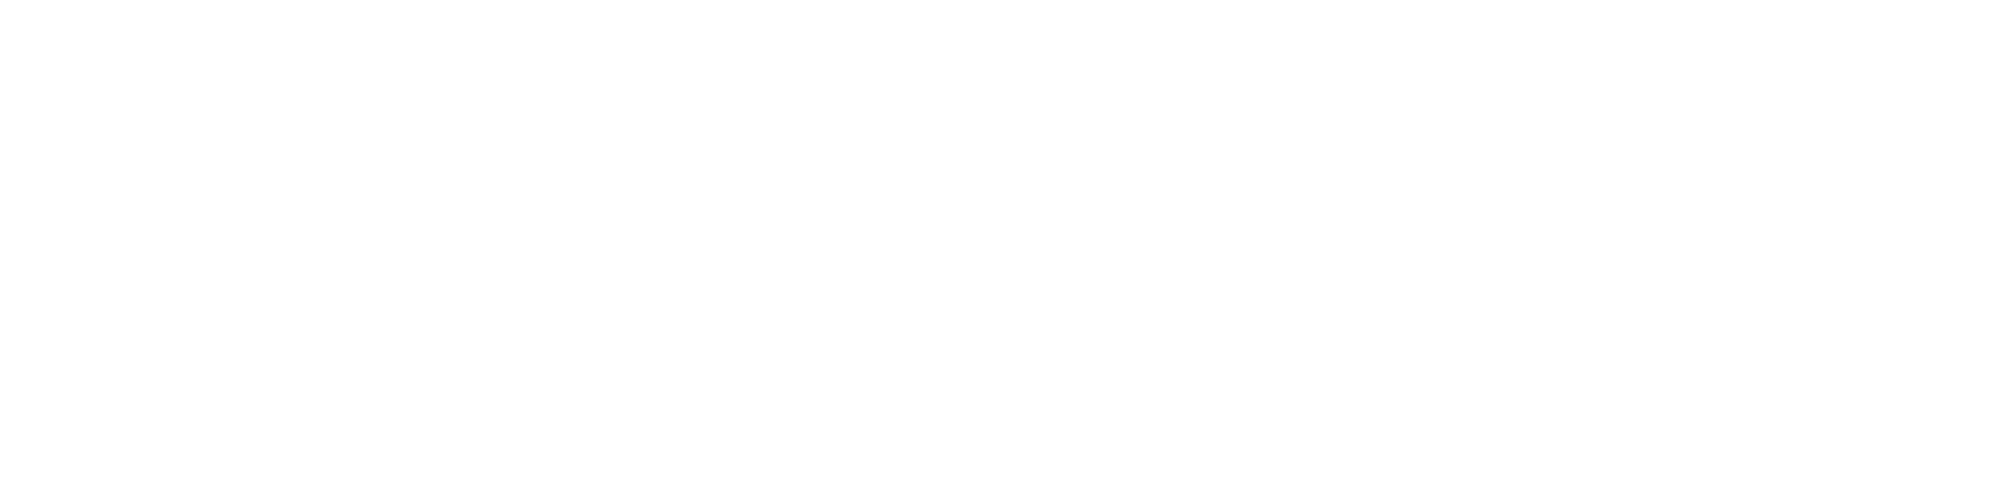 Logos and Photos.